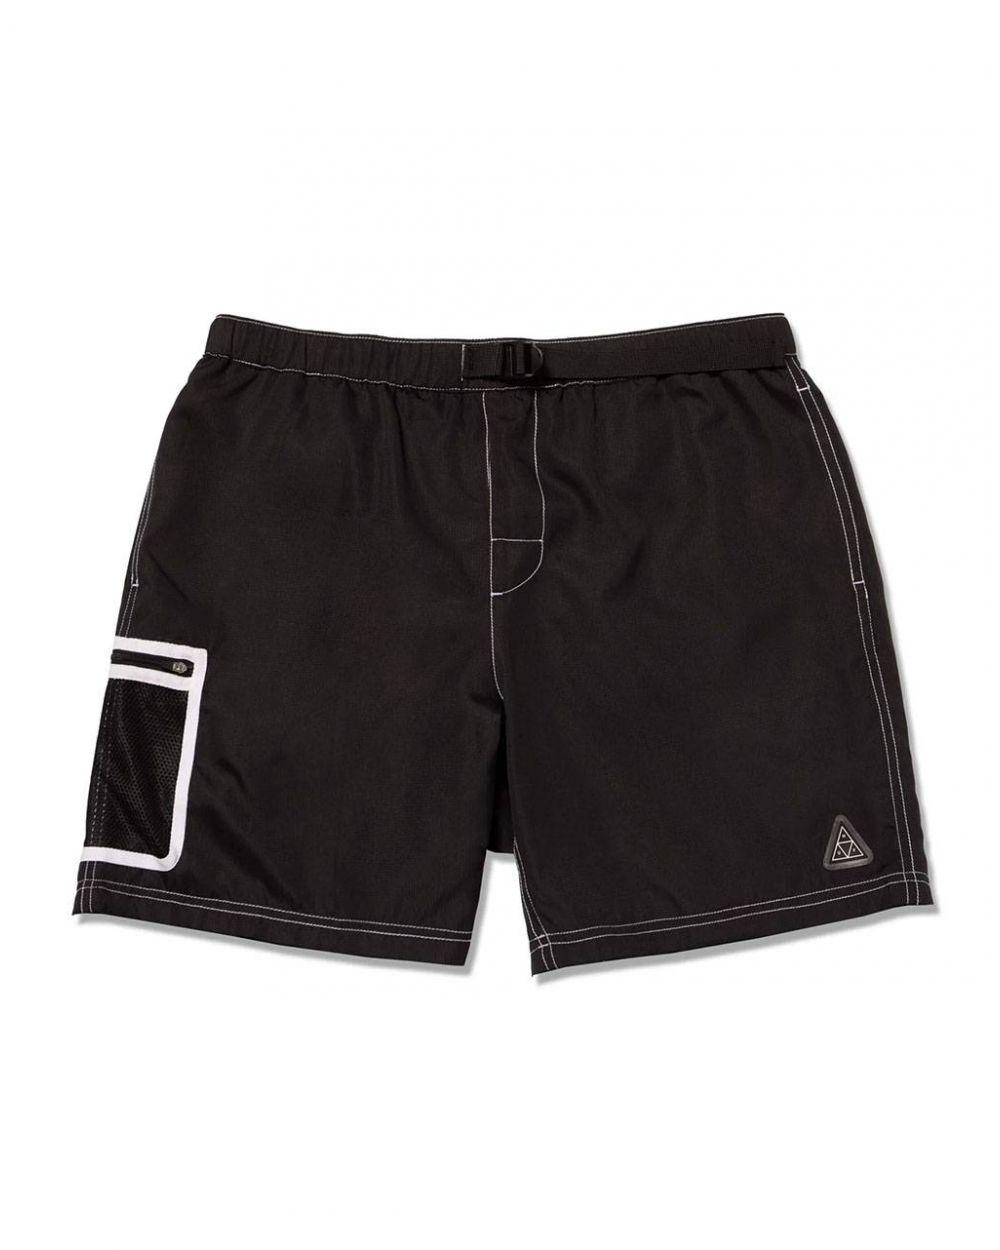 Huf Peak contrast shorts - black Huf Shorts 77,87€